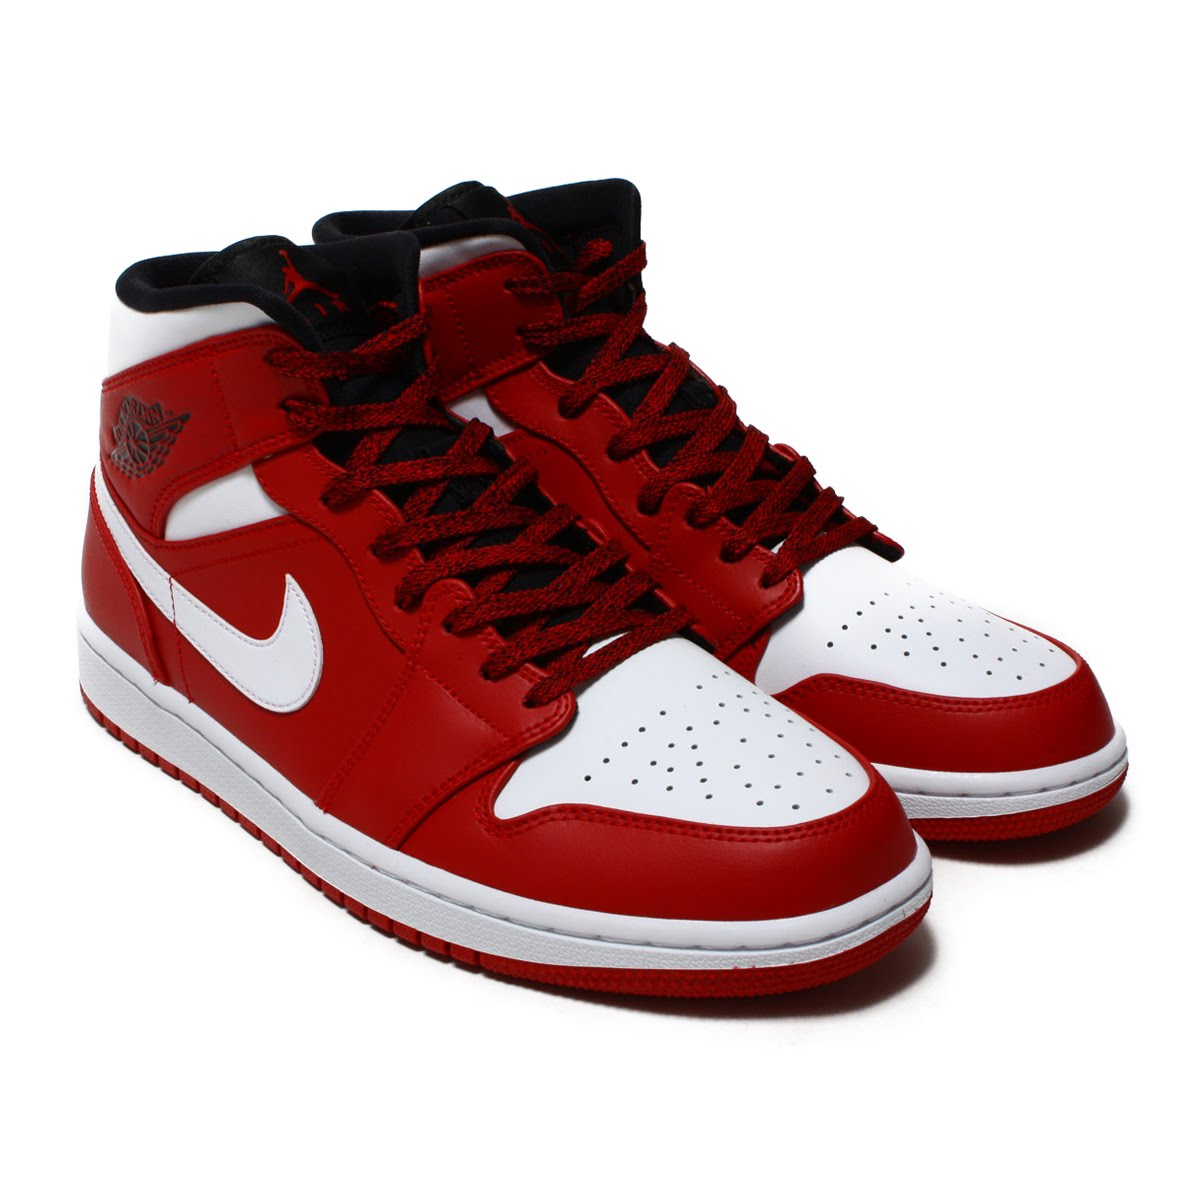 c19d4ddf244 atmos pink  NIKE AIR JORDAN 1 MID (Nike Air Jordan 1 mid) GYM RED ...